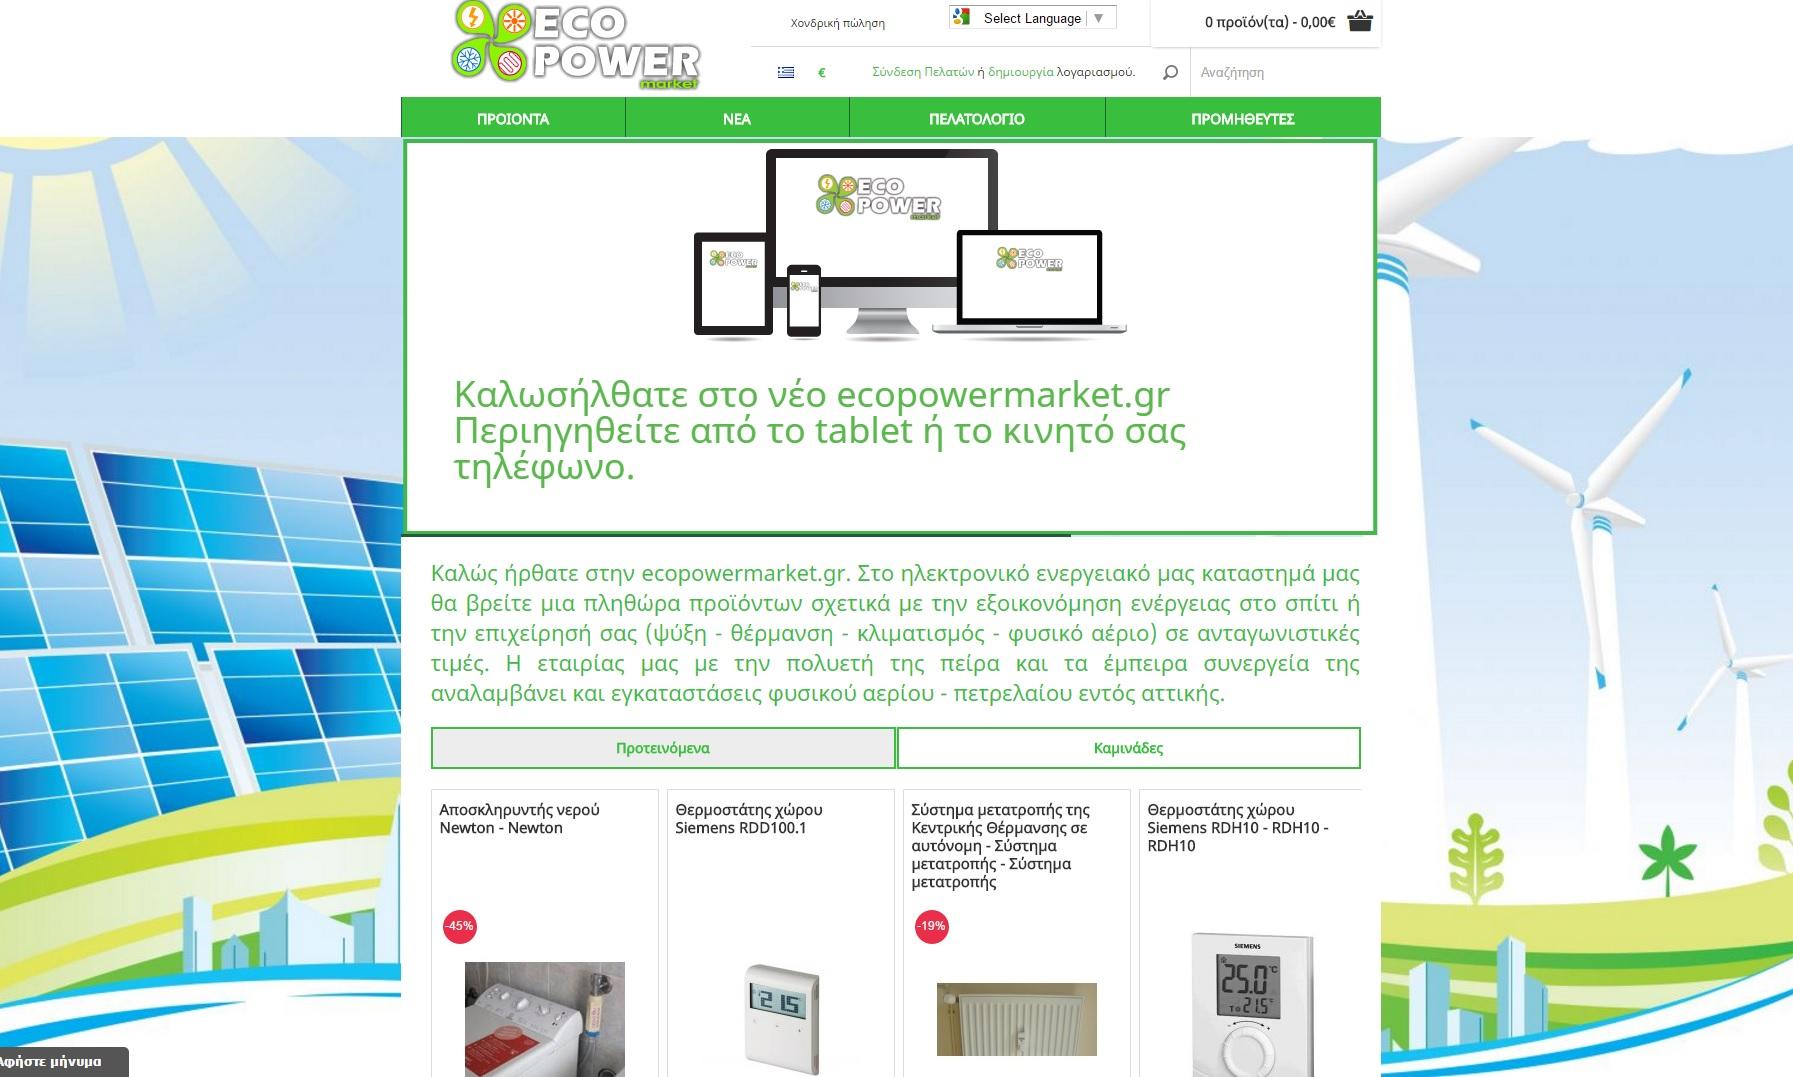 http://www.jupiweb.com/assets/uploads/files/thumbs/thumb_dc150-ecopowermarket.jpg